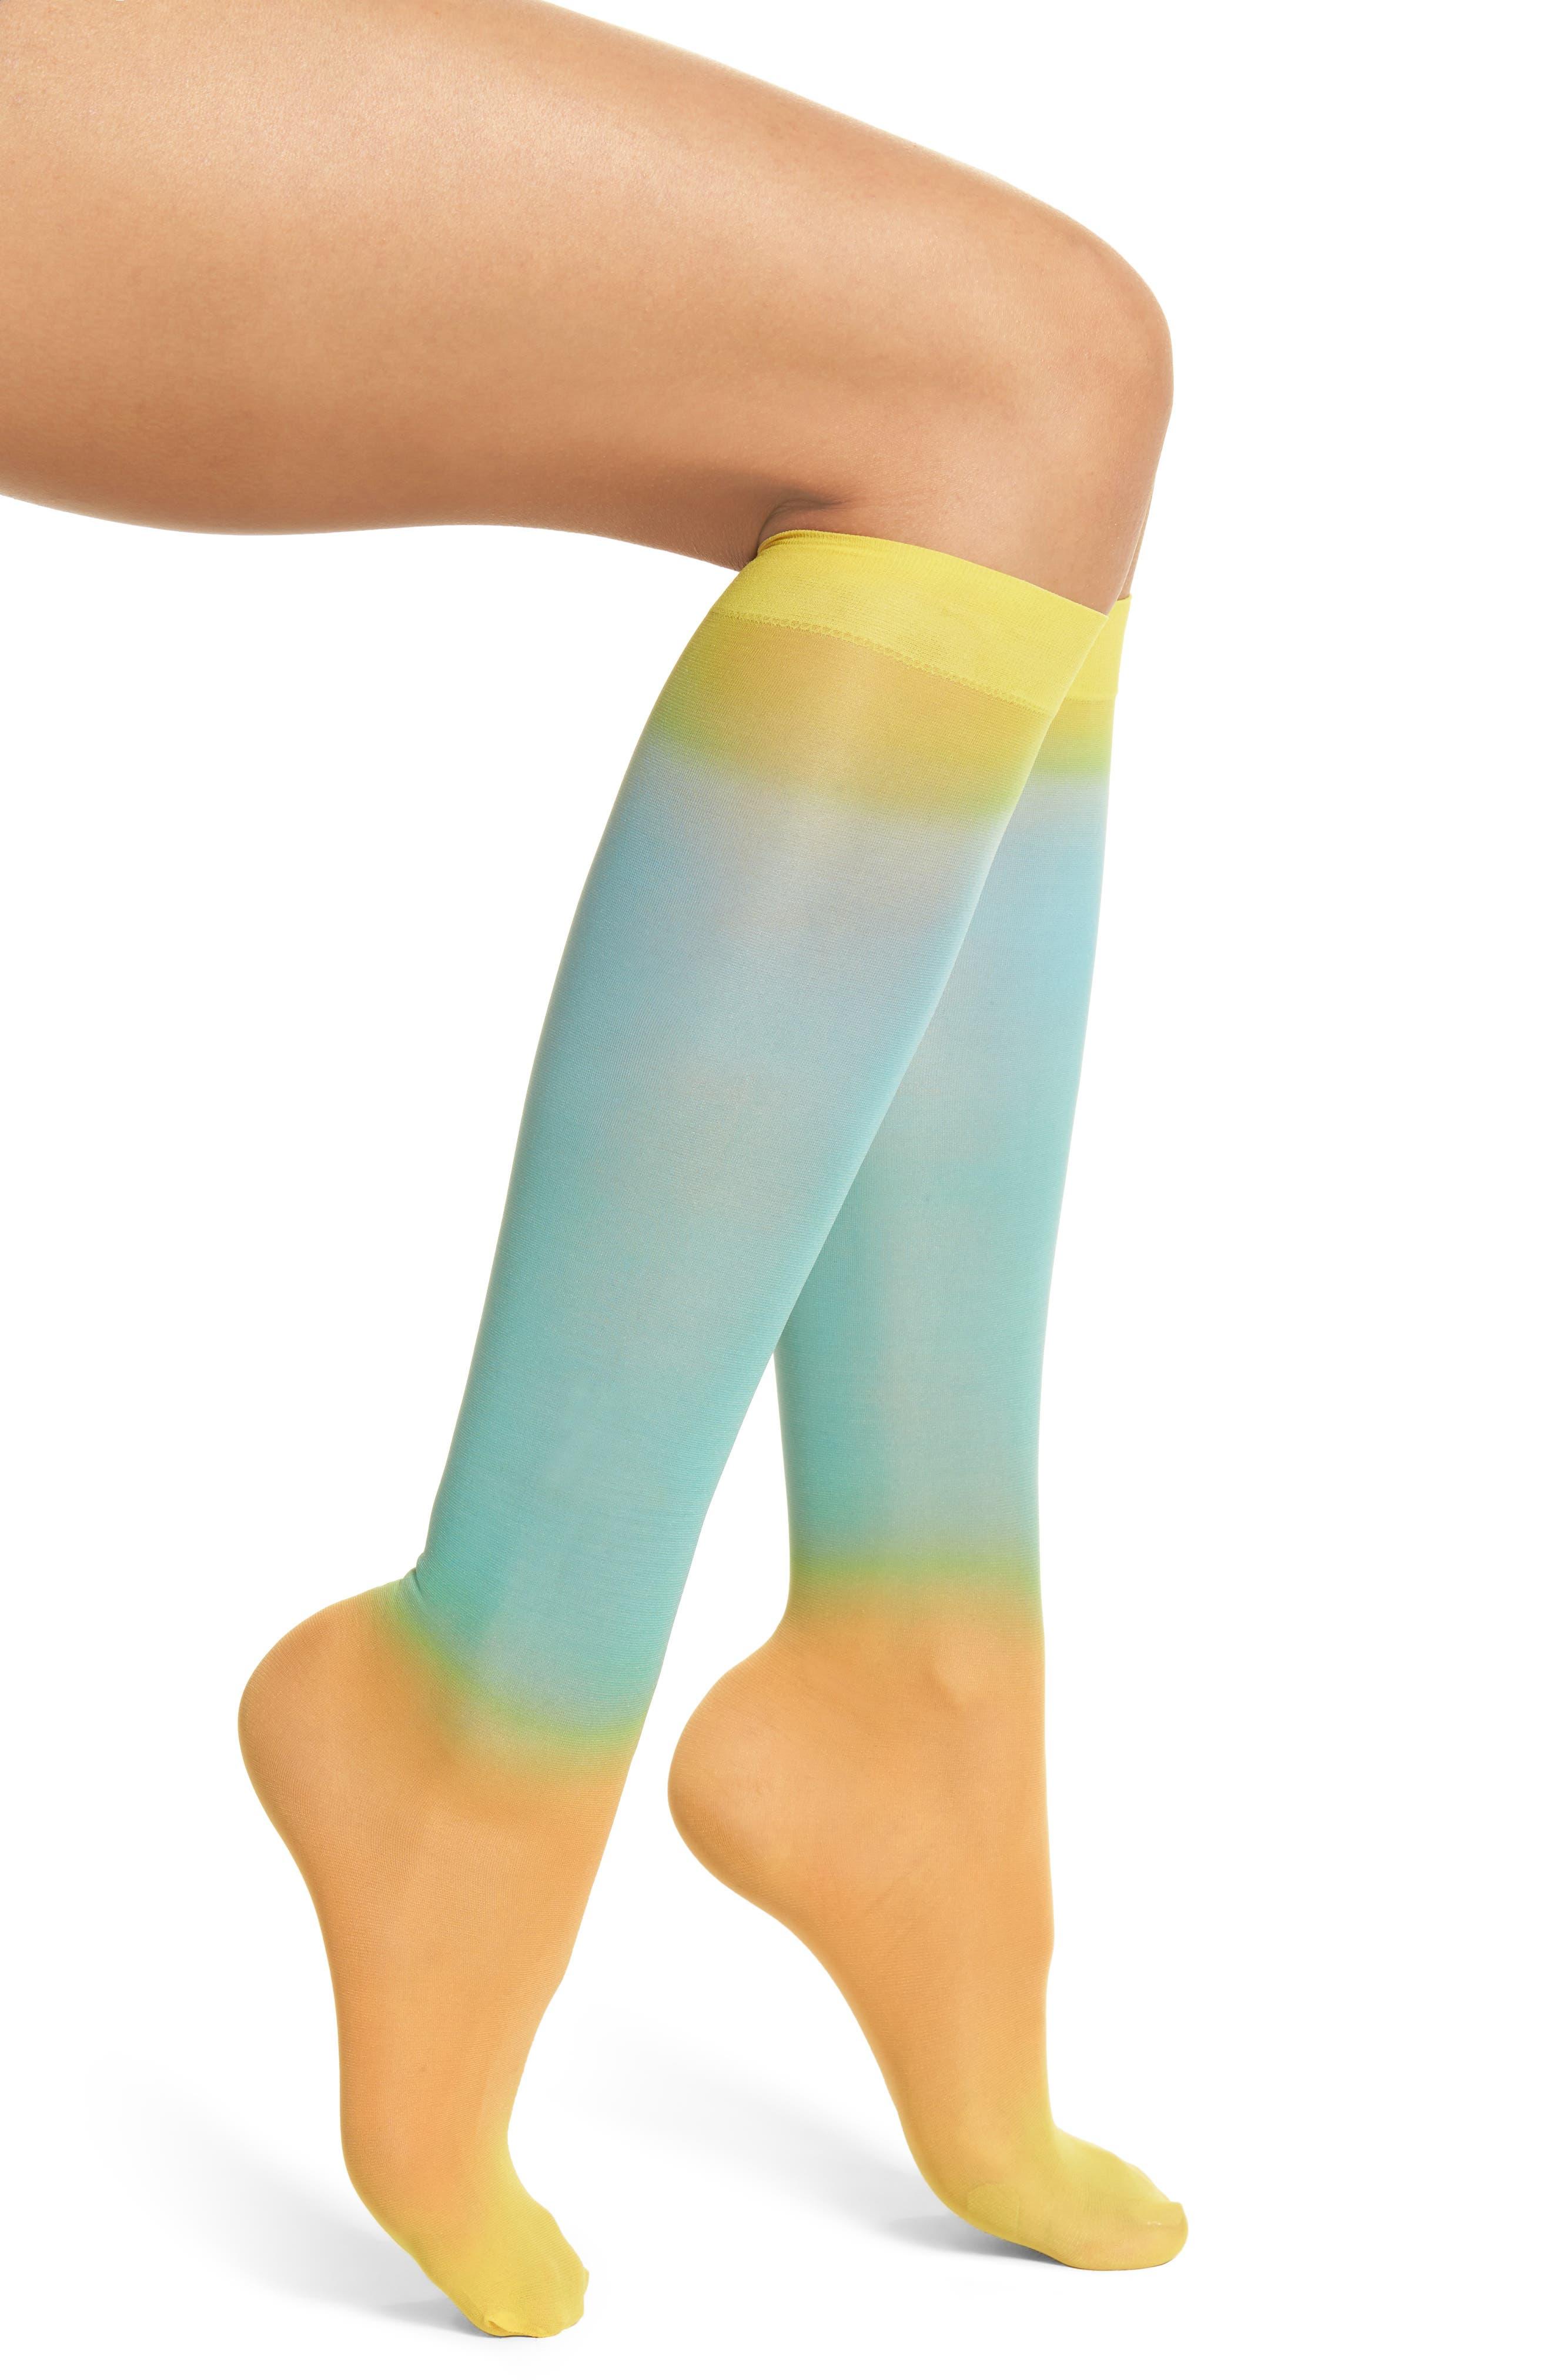 HYSTERIA BY HAPPY SOCKS Mia Print Knee High Socks, Main, color, 449